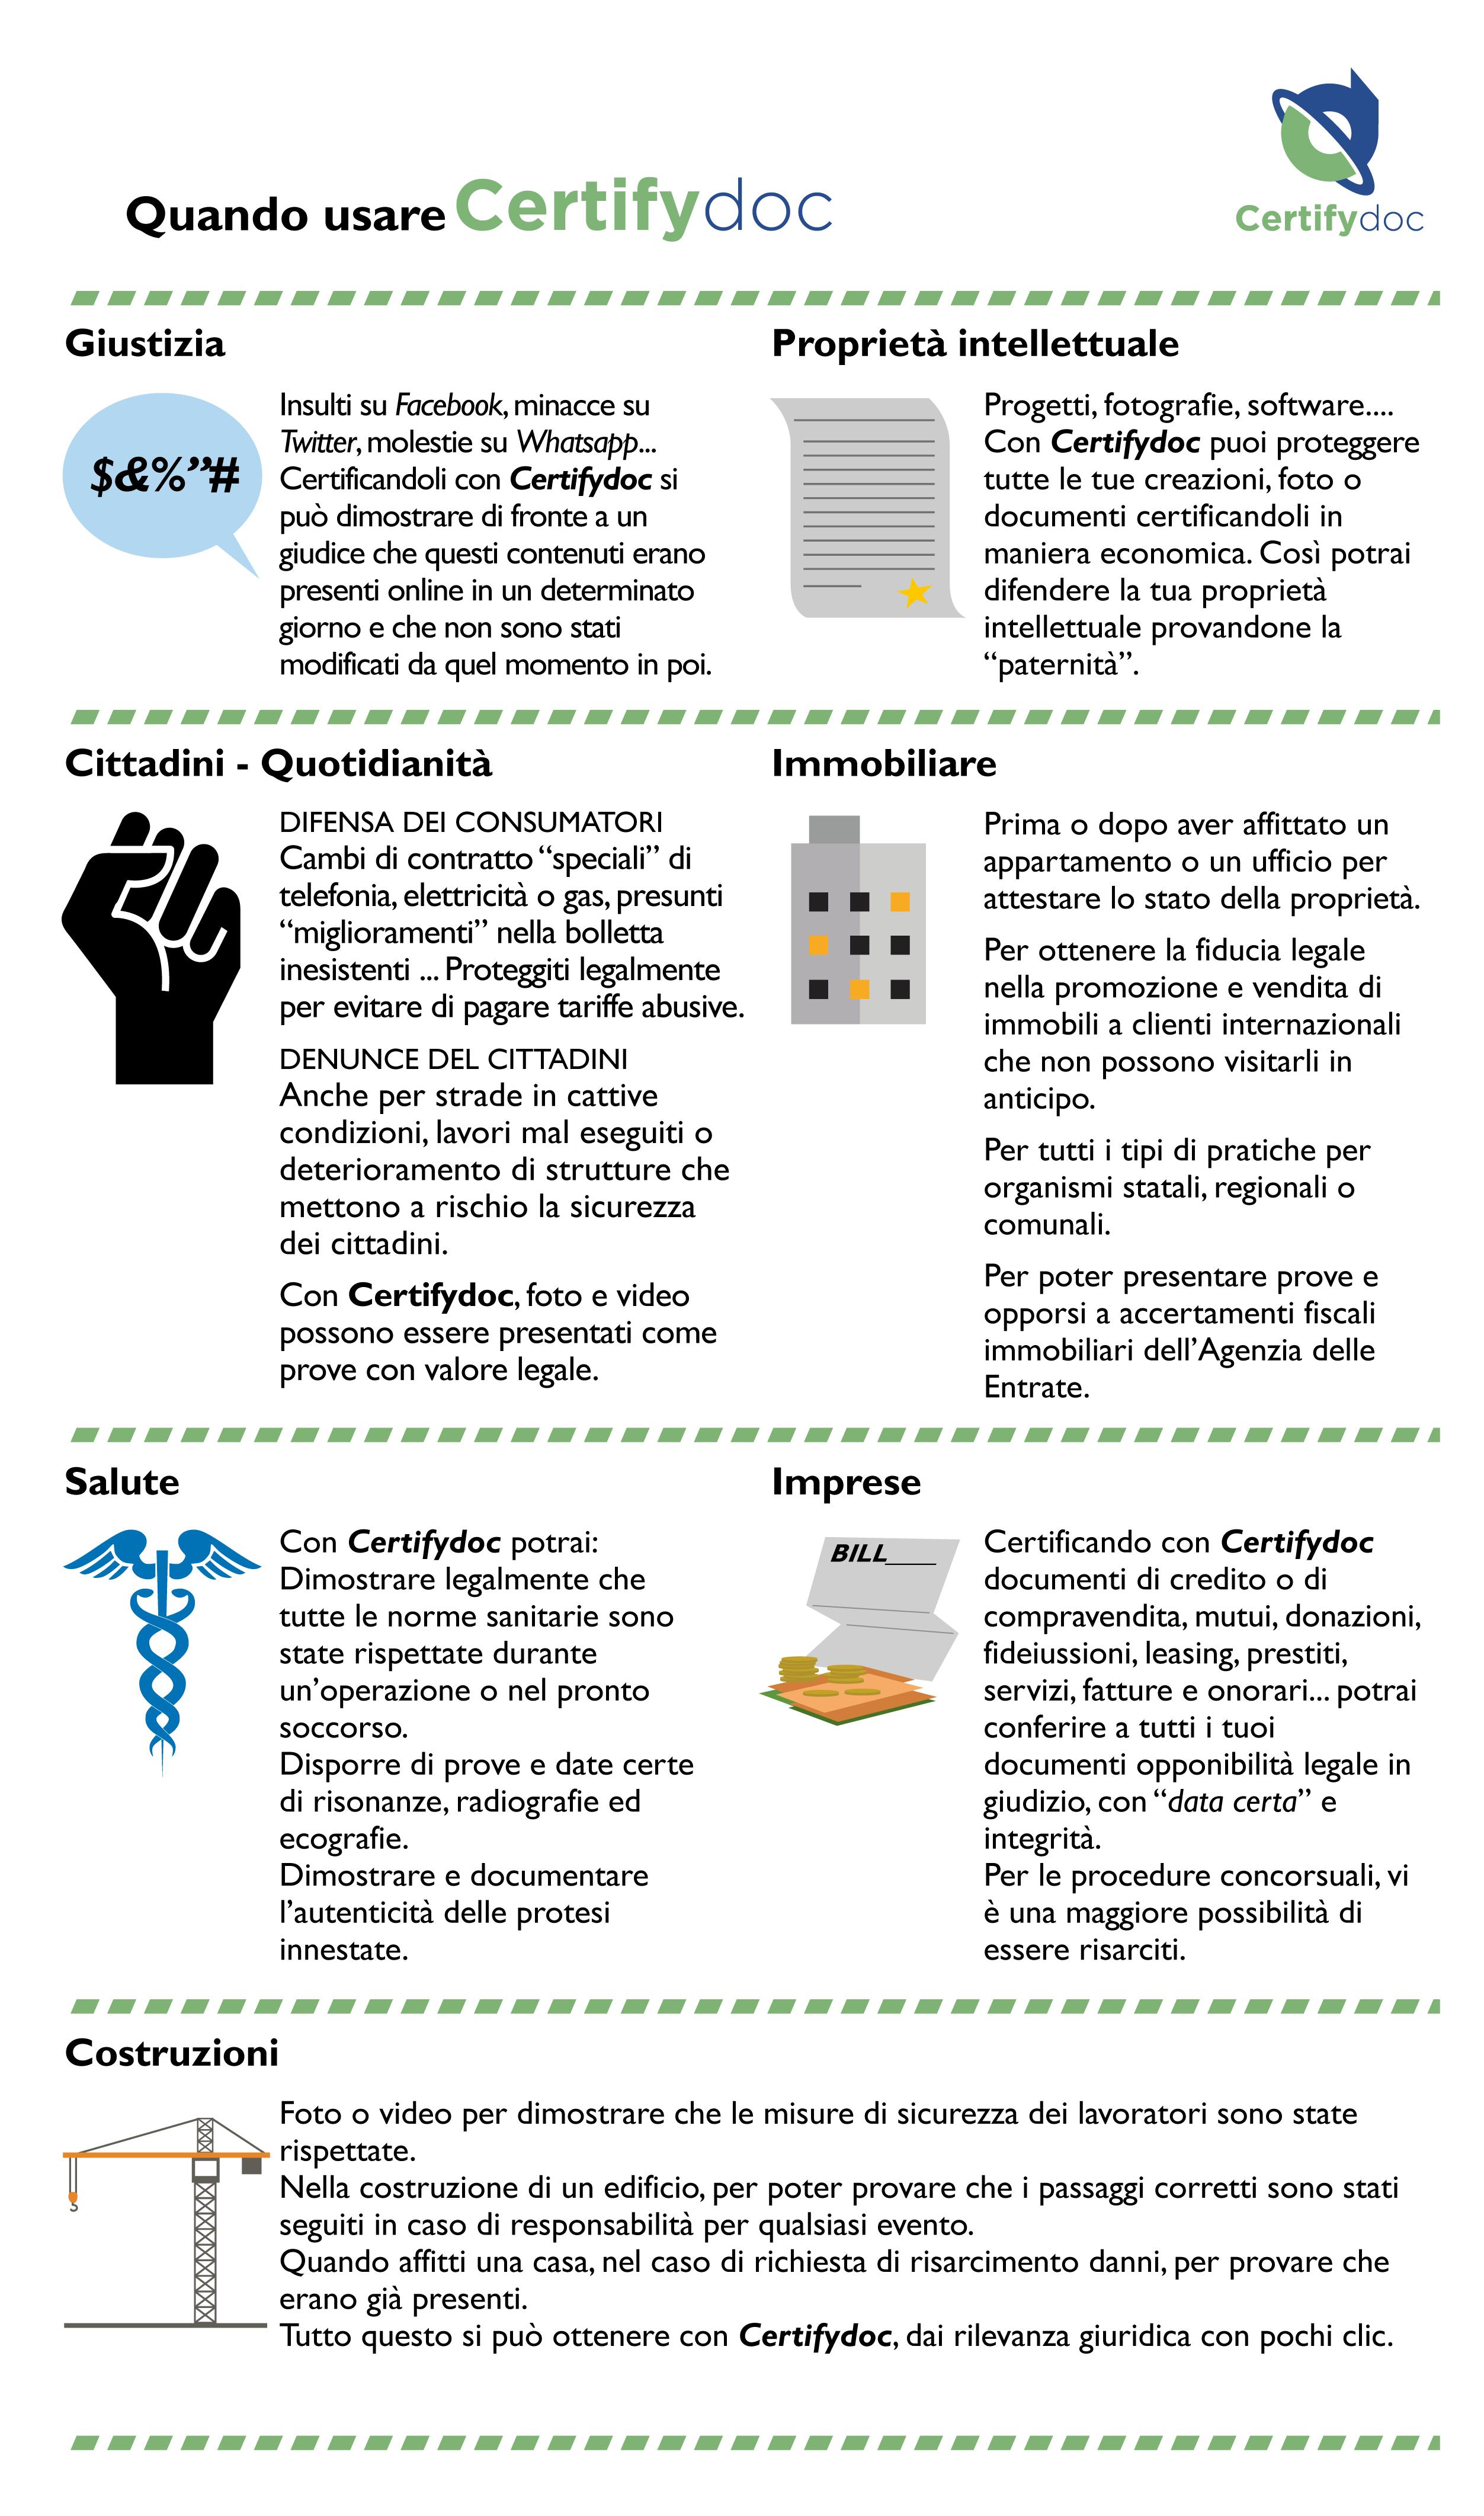 Infografica-Usi-Certifydoc_ITA